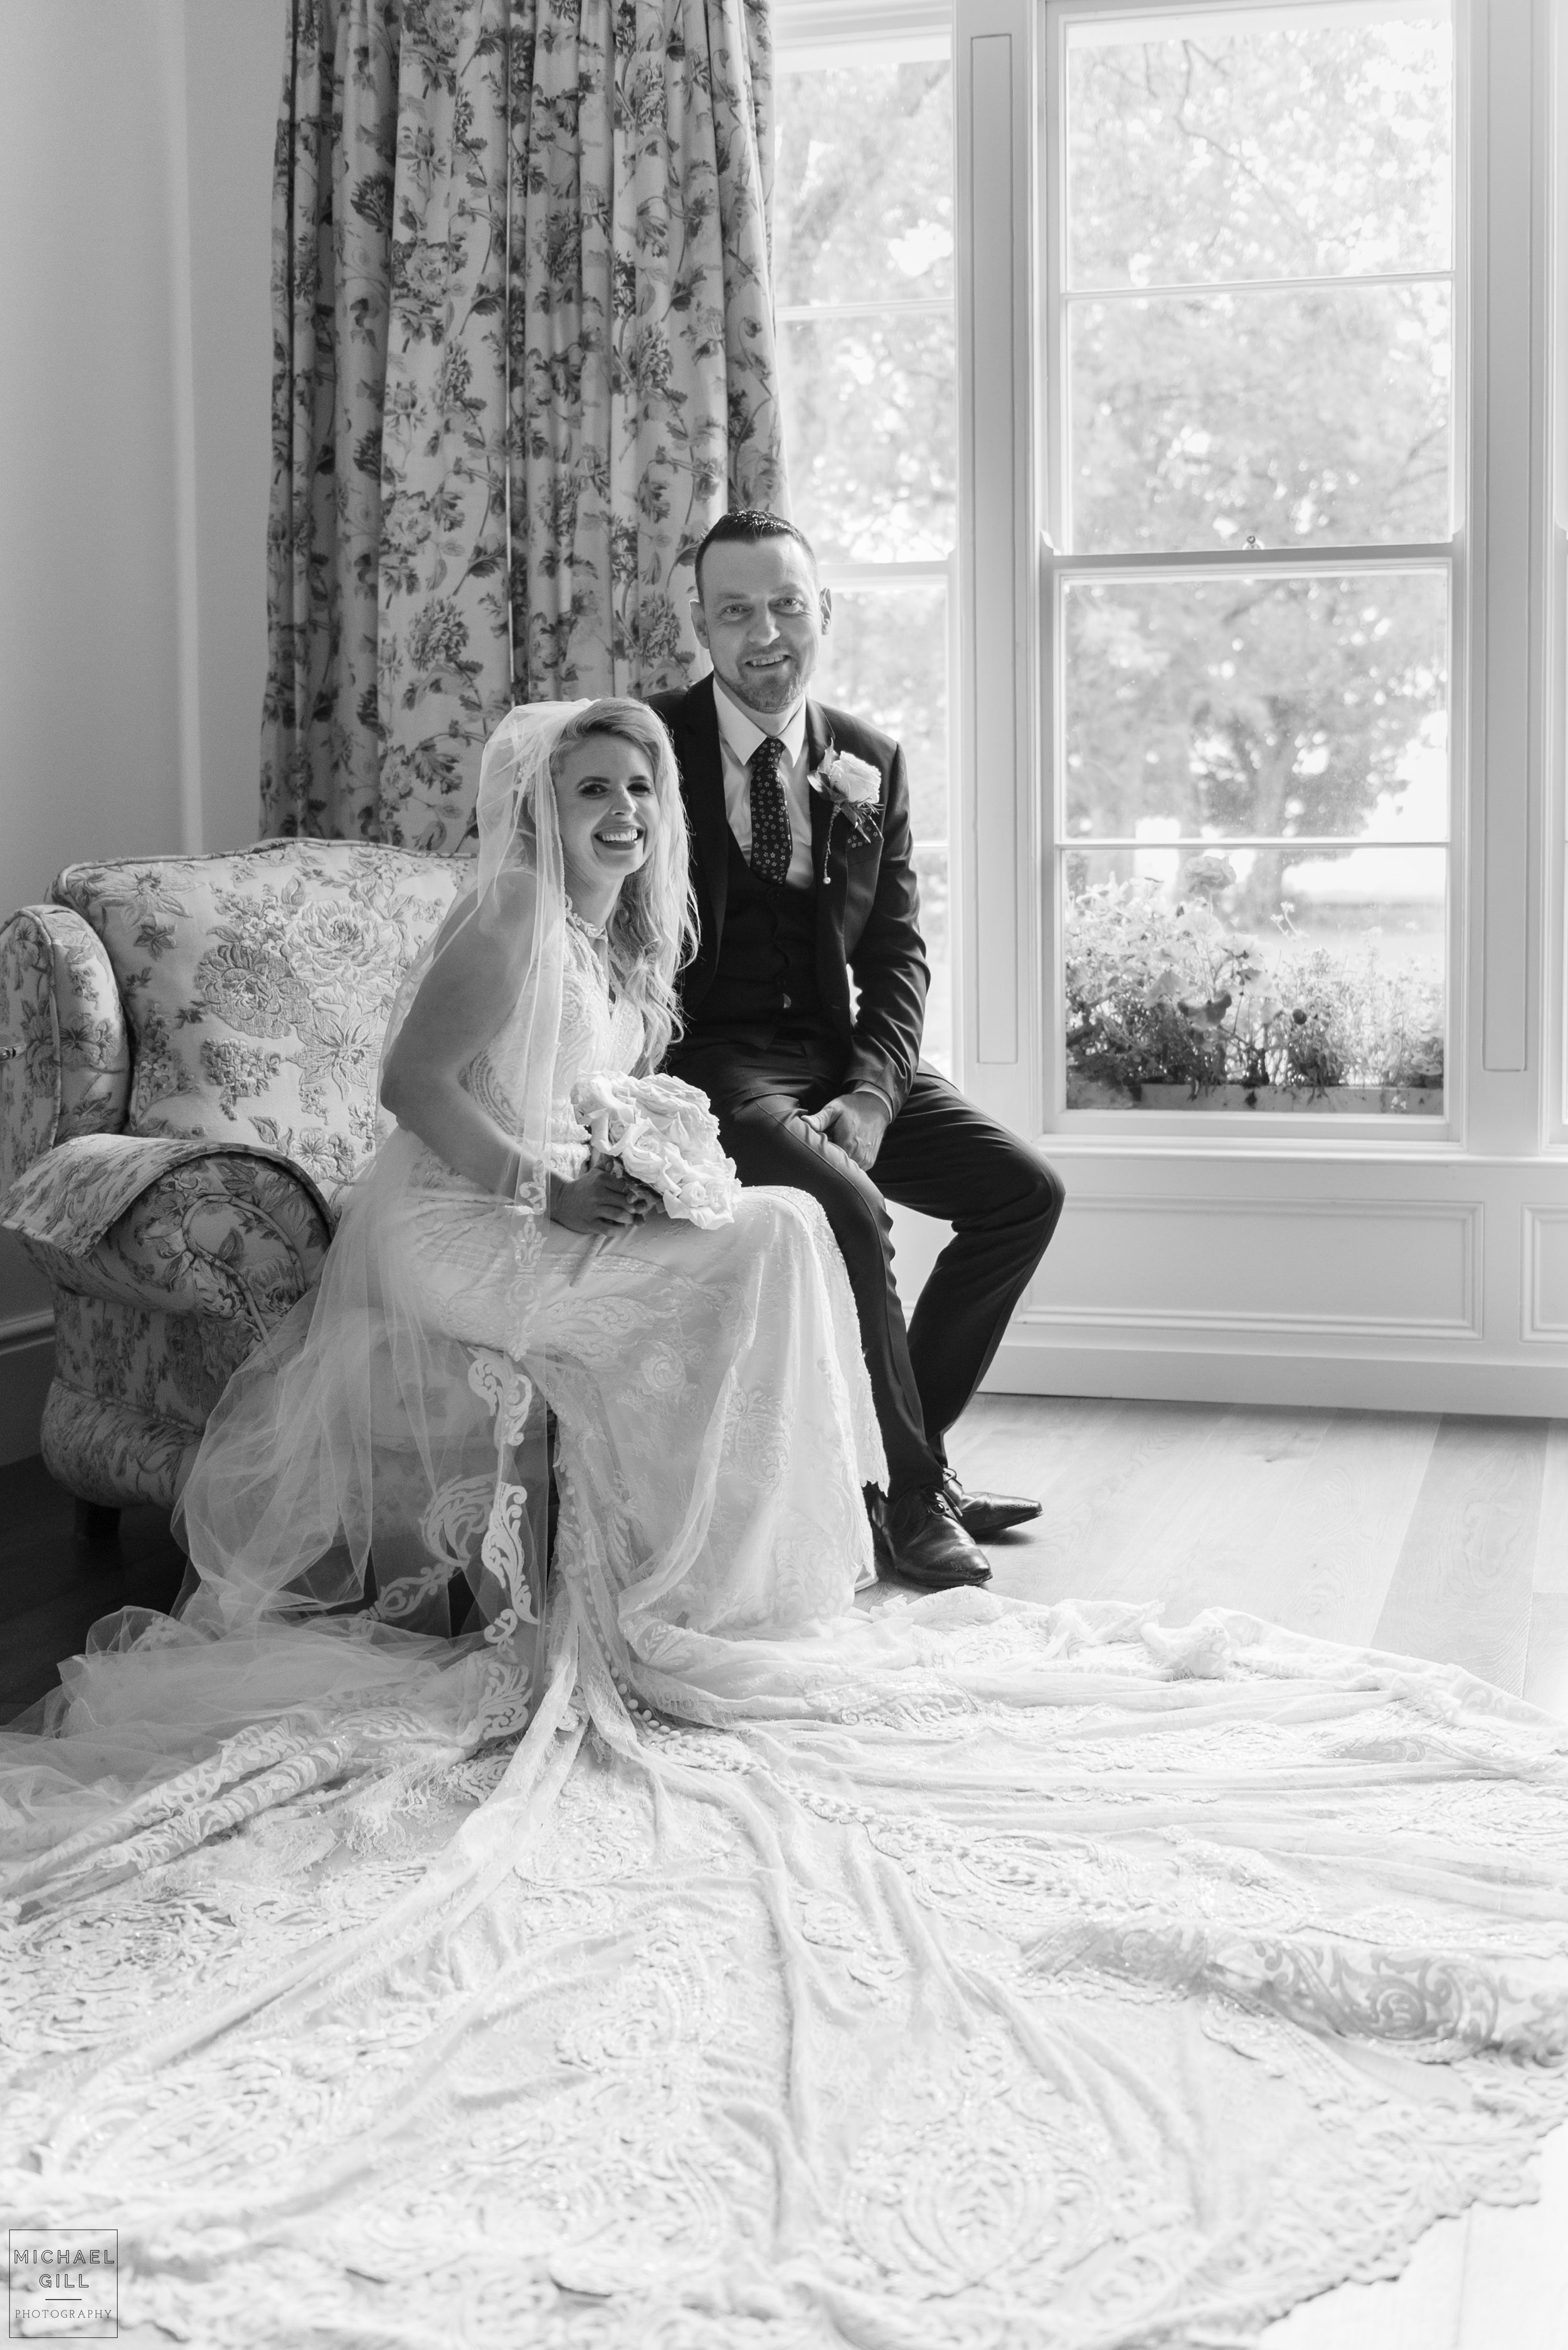 Michael_Gill_Photography_Wedding_Ballyliffin003.JPG